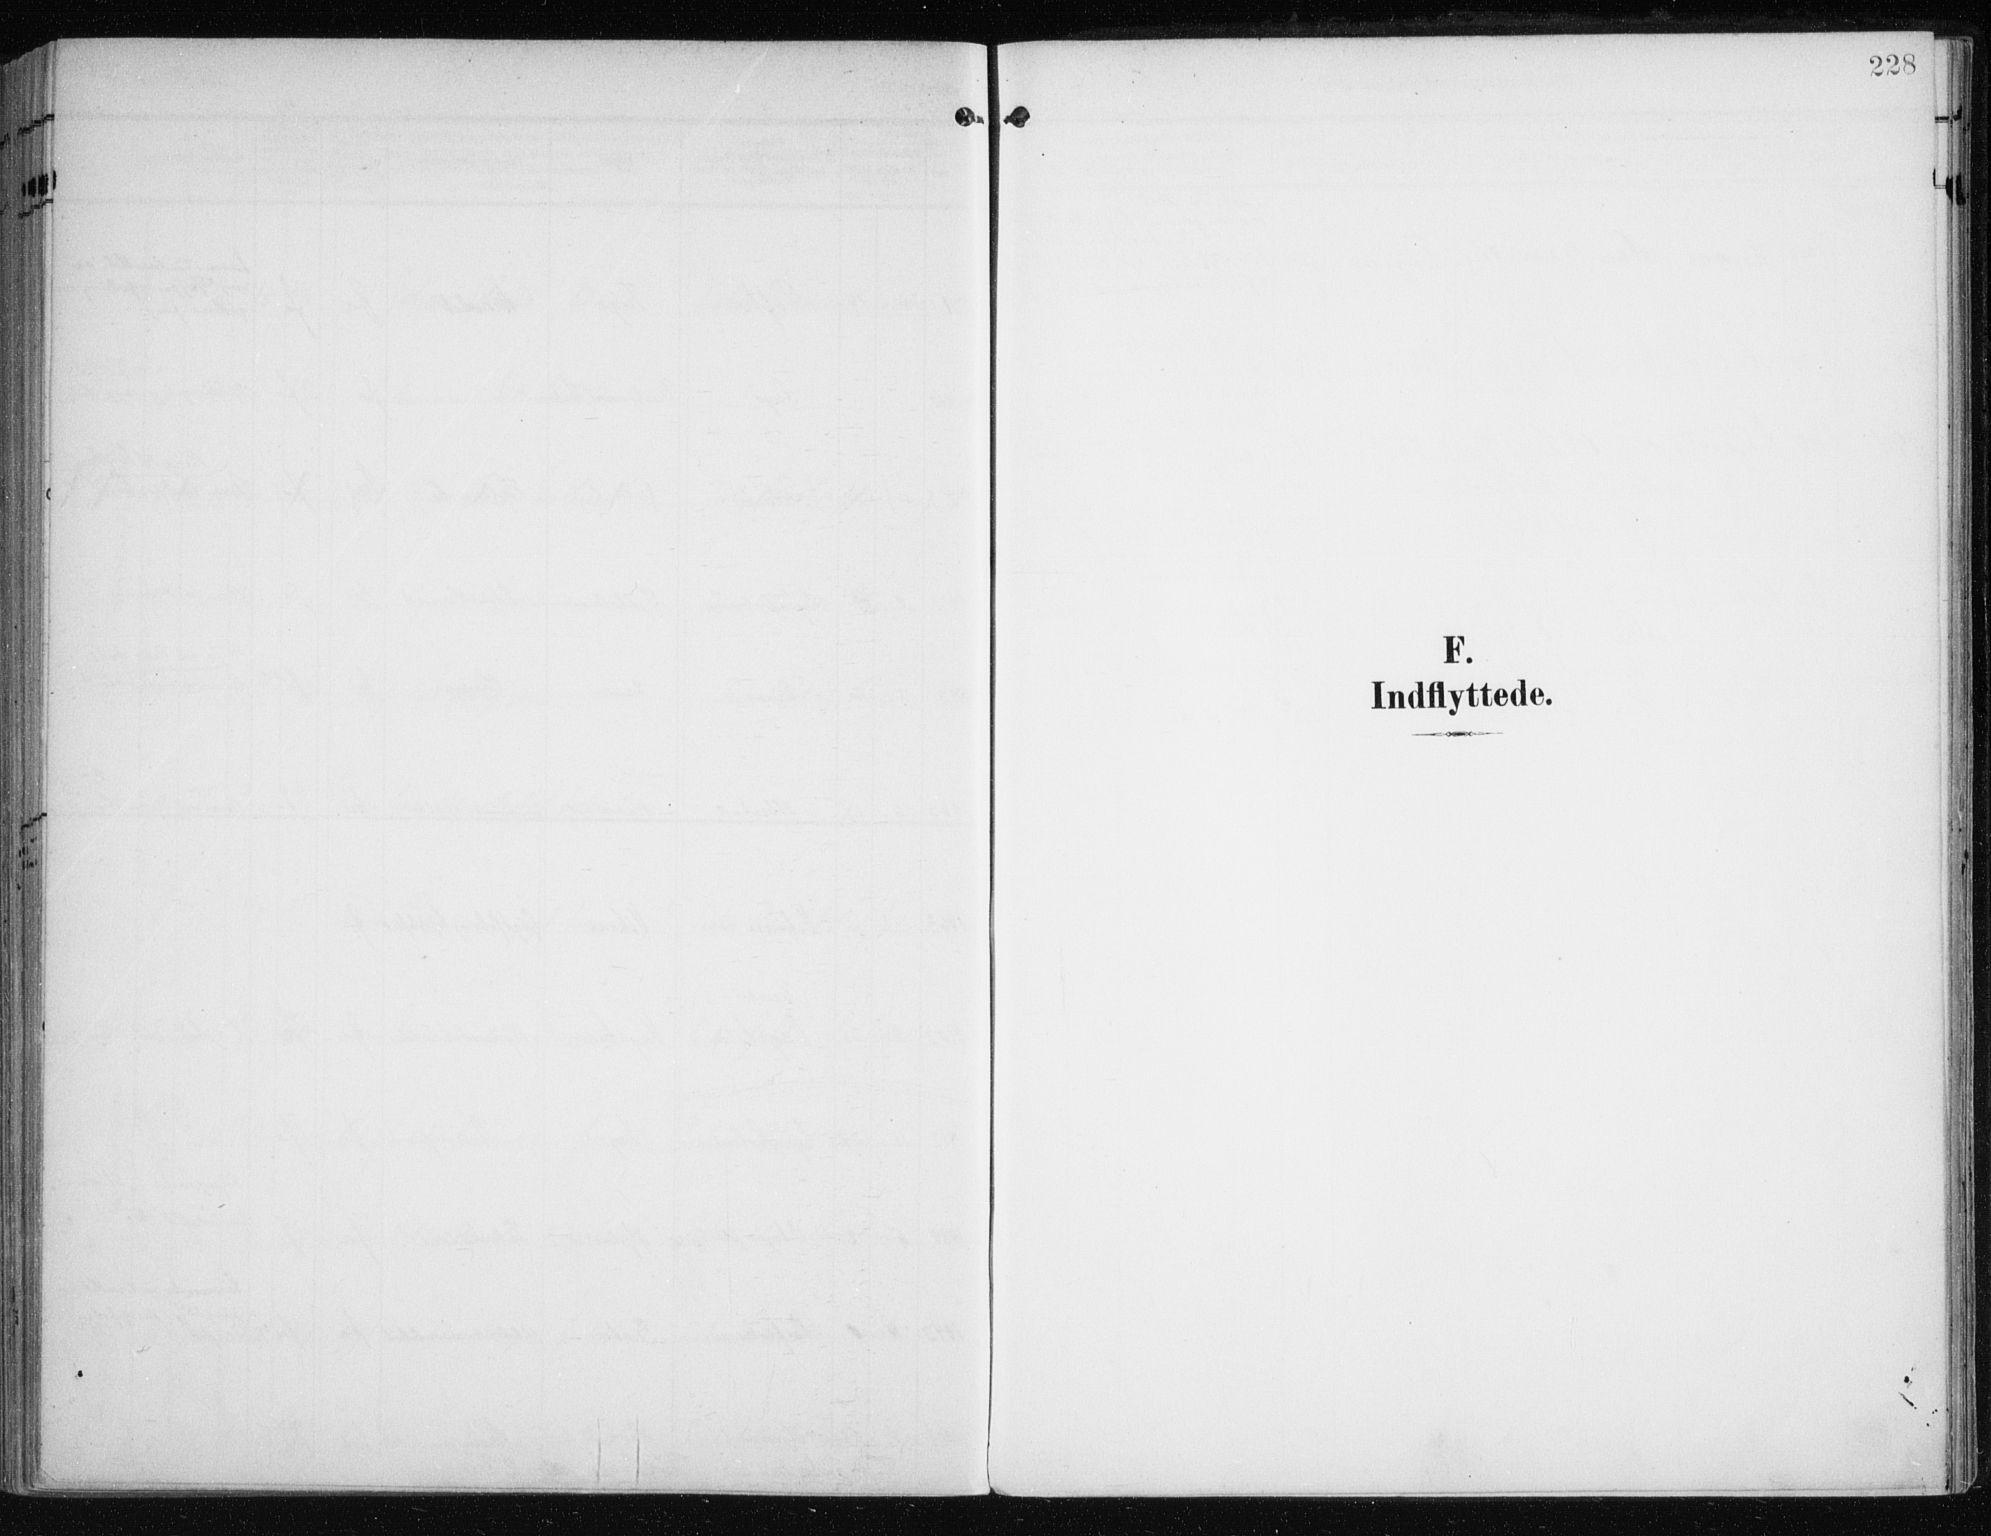 SATØ, Måsøy sokneprestkontor, H/Ha/L0009kirke: Ministerialbok nr. 9, 1903-1914, s. 228